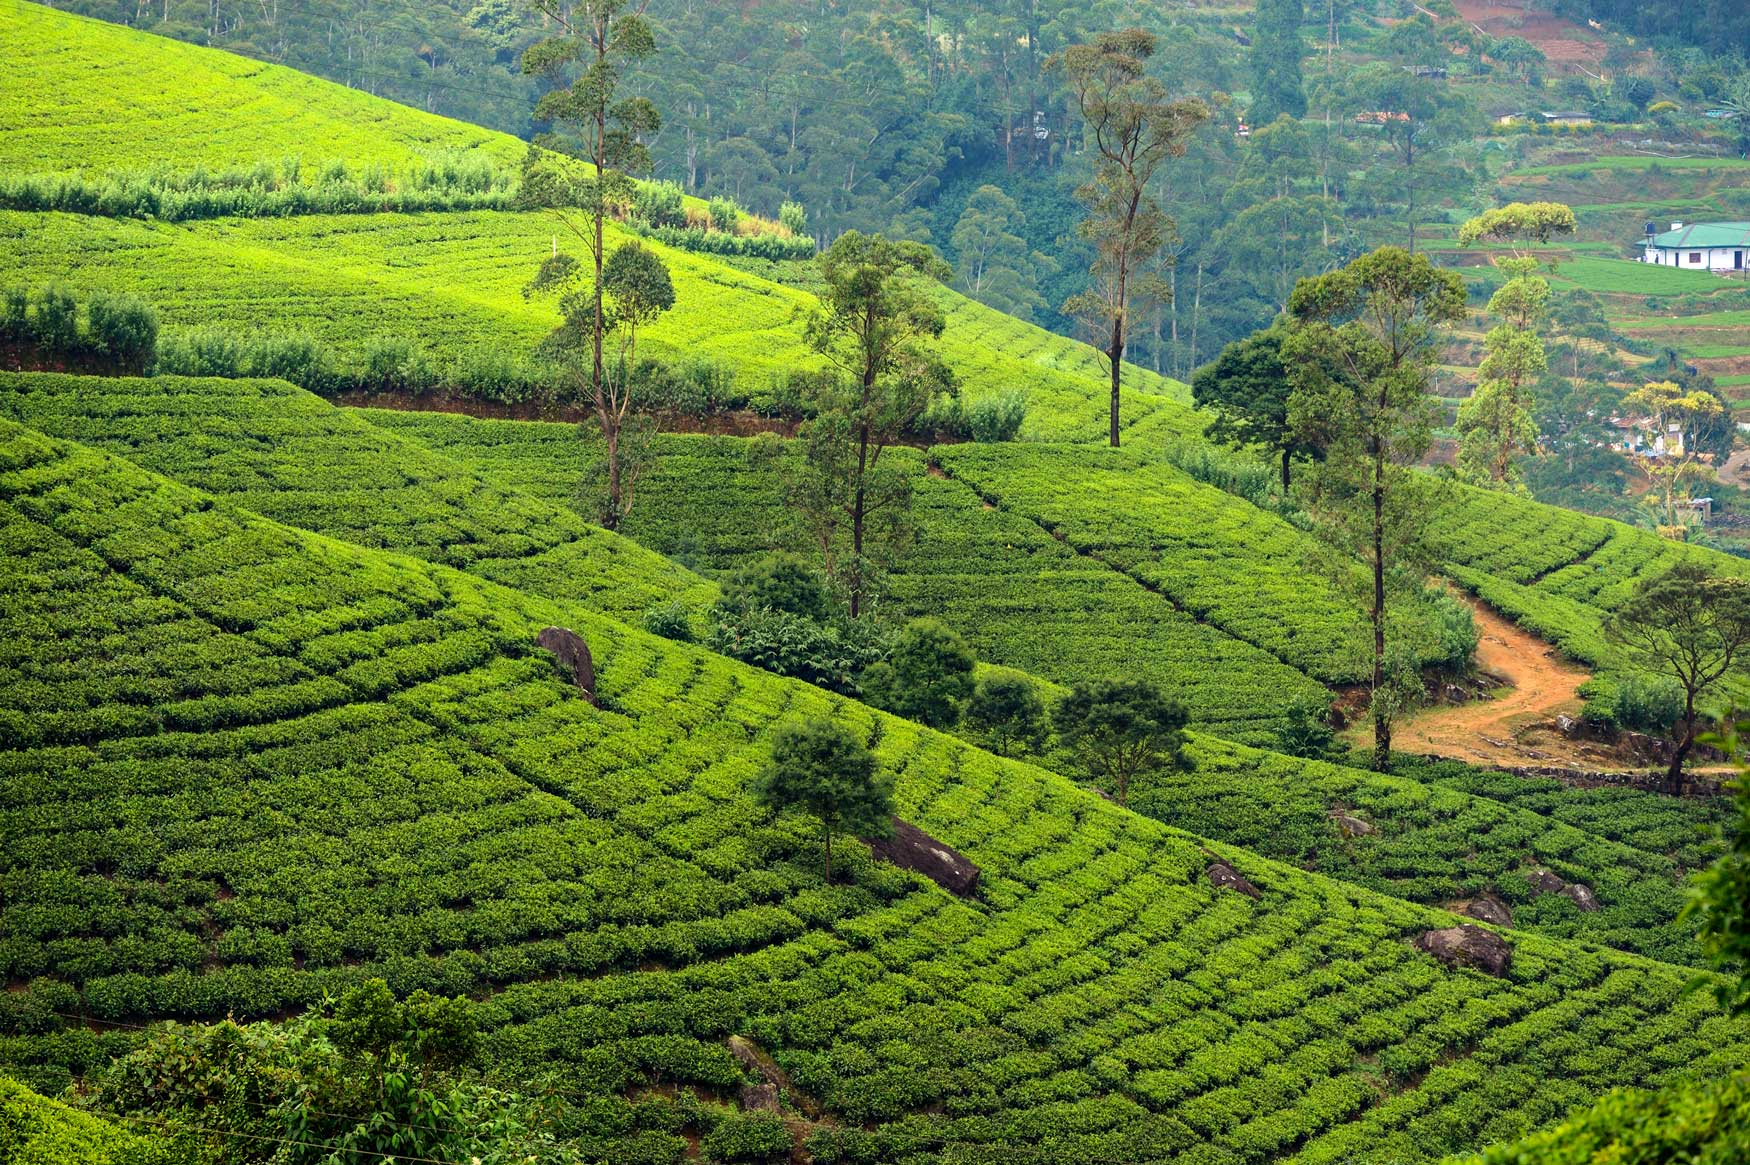 A Sri Lankan tea estate